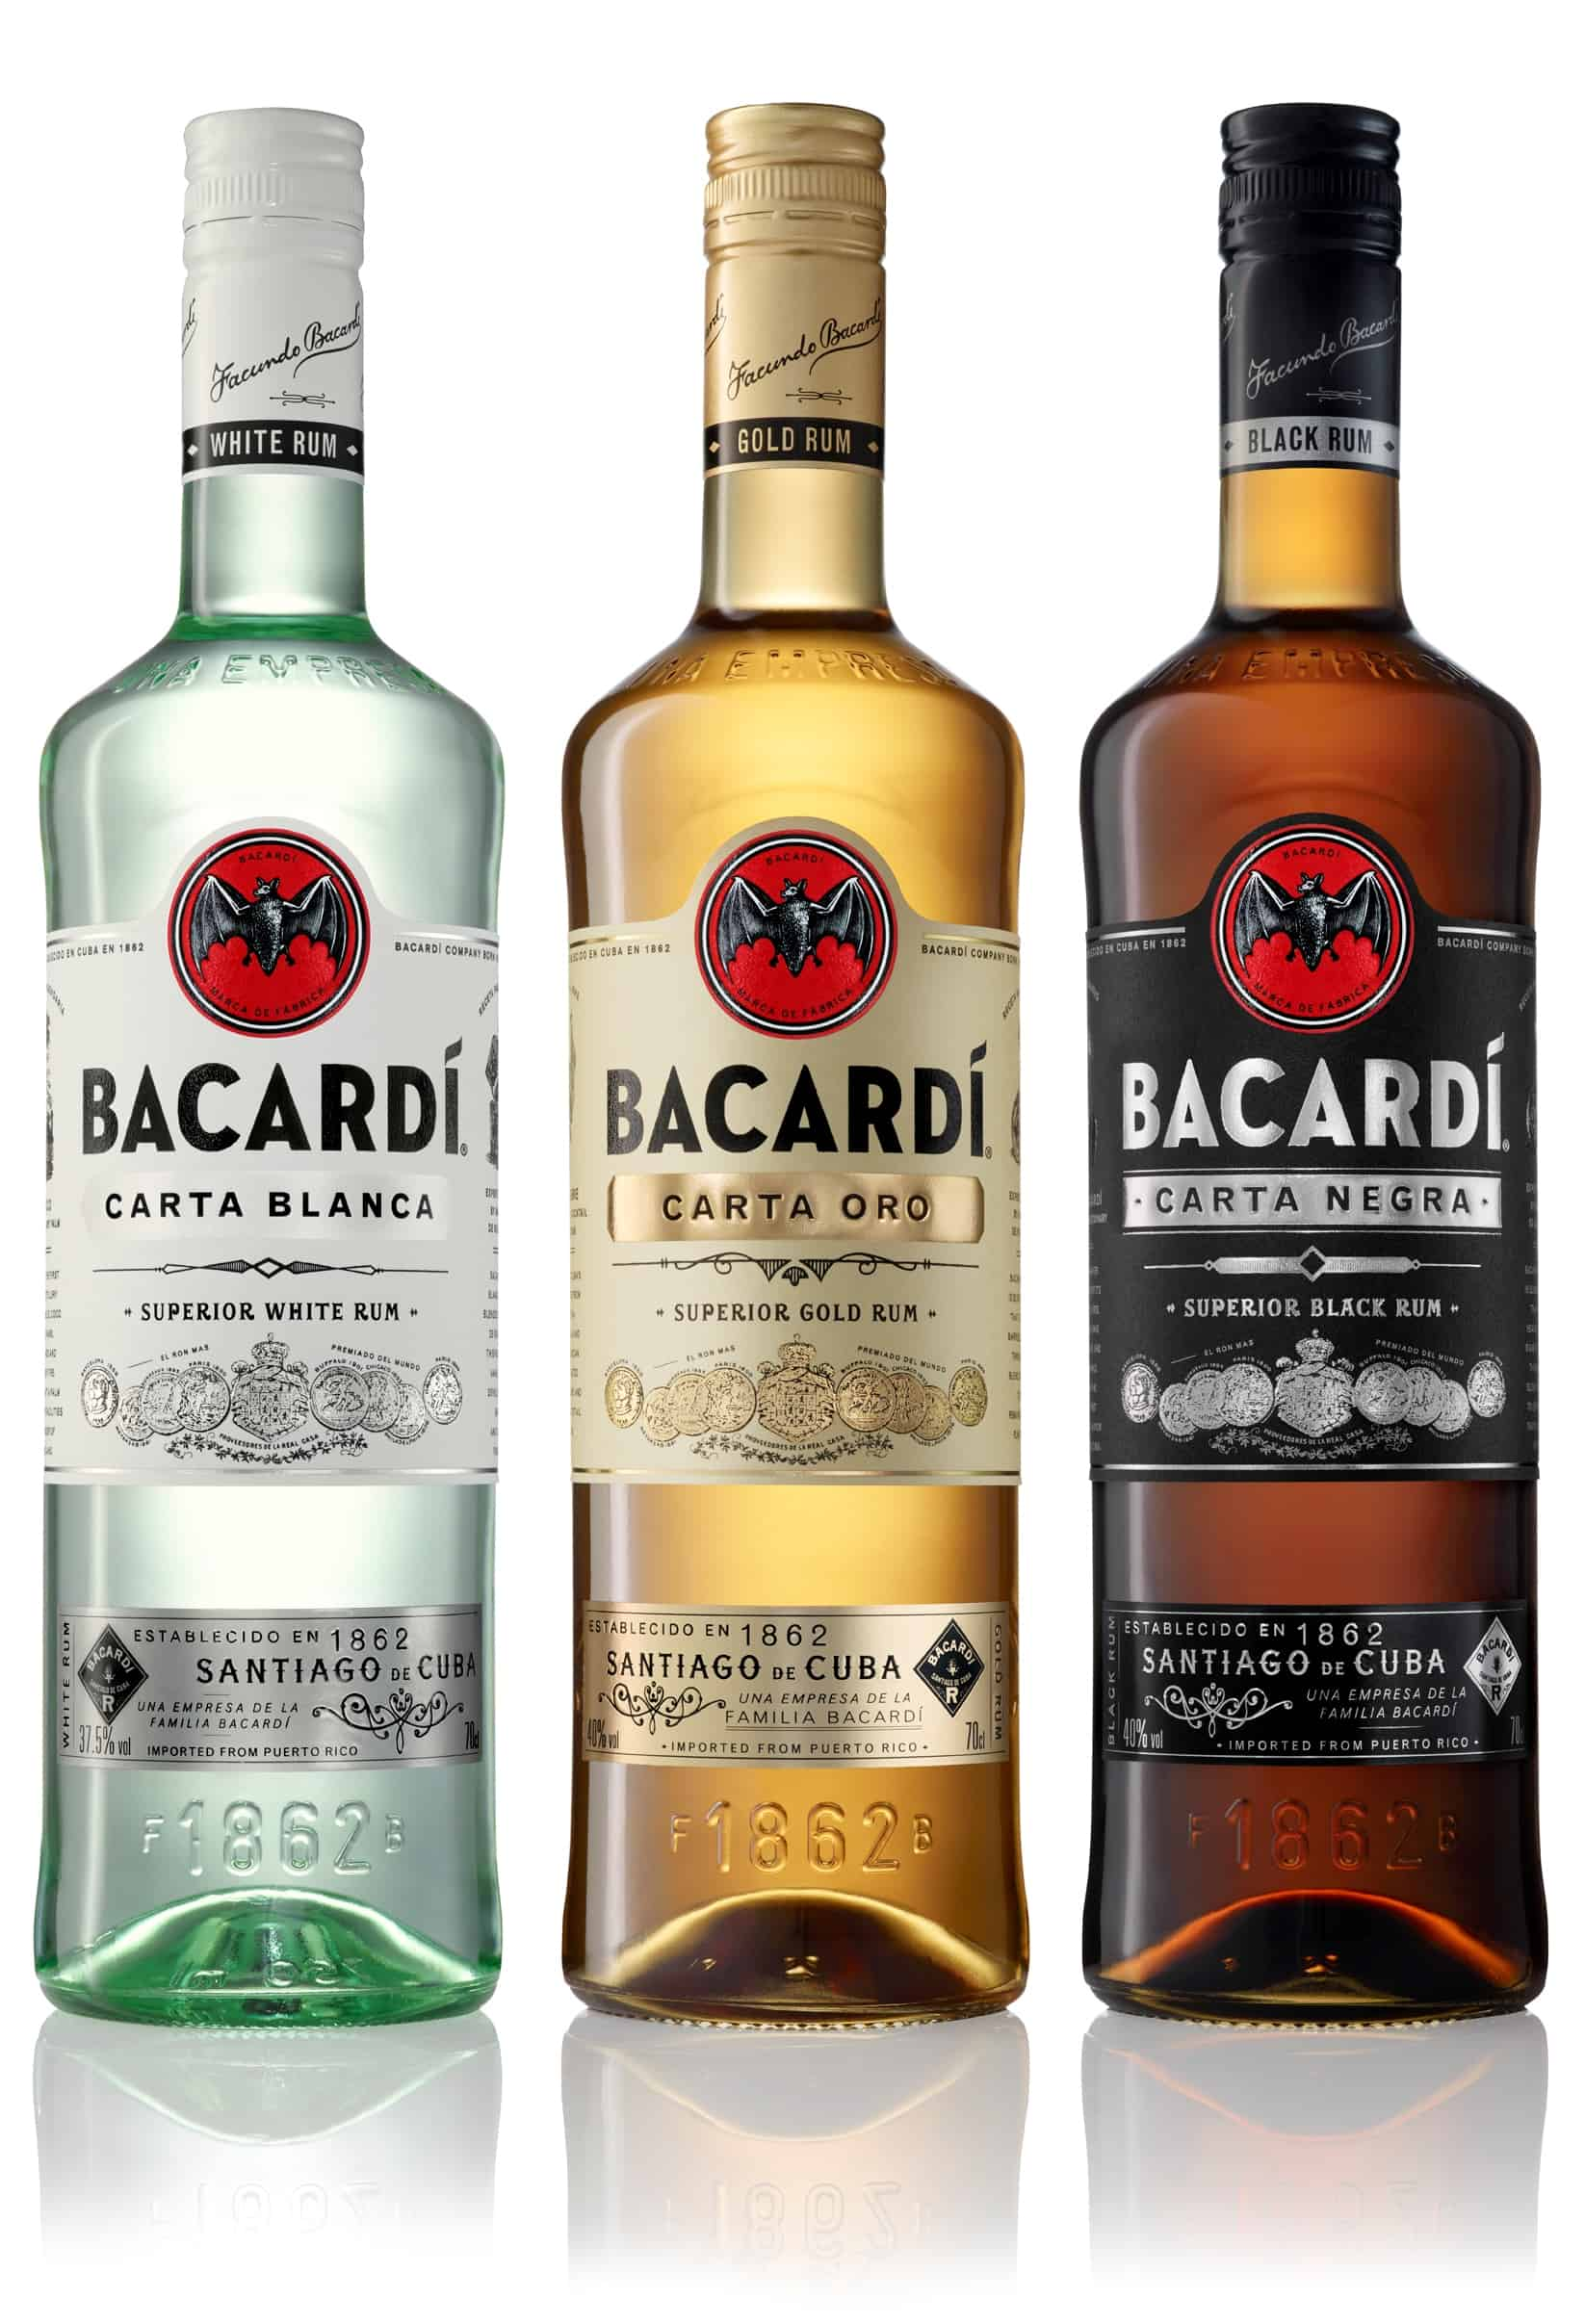 BACARDI Carta Range